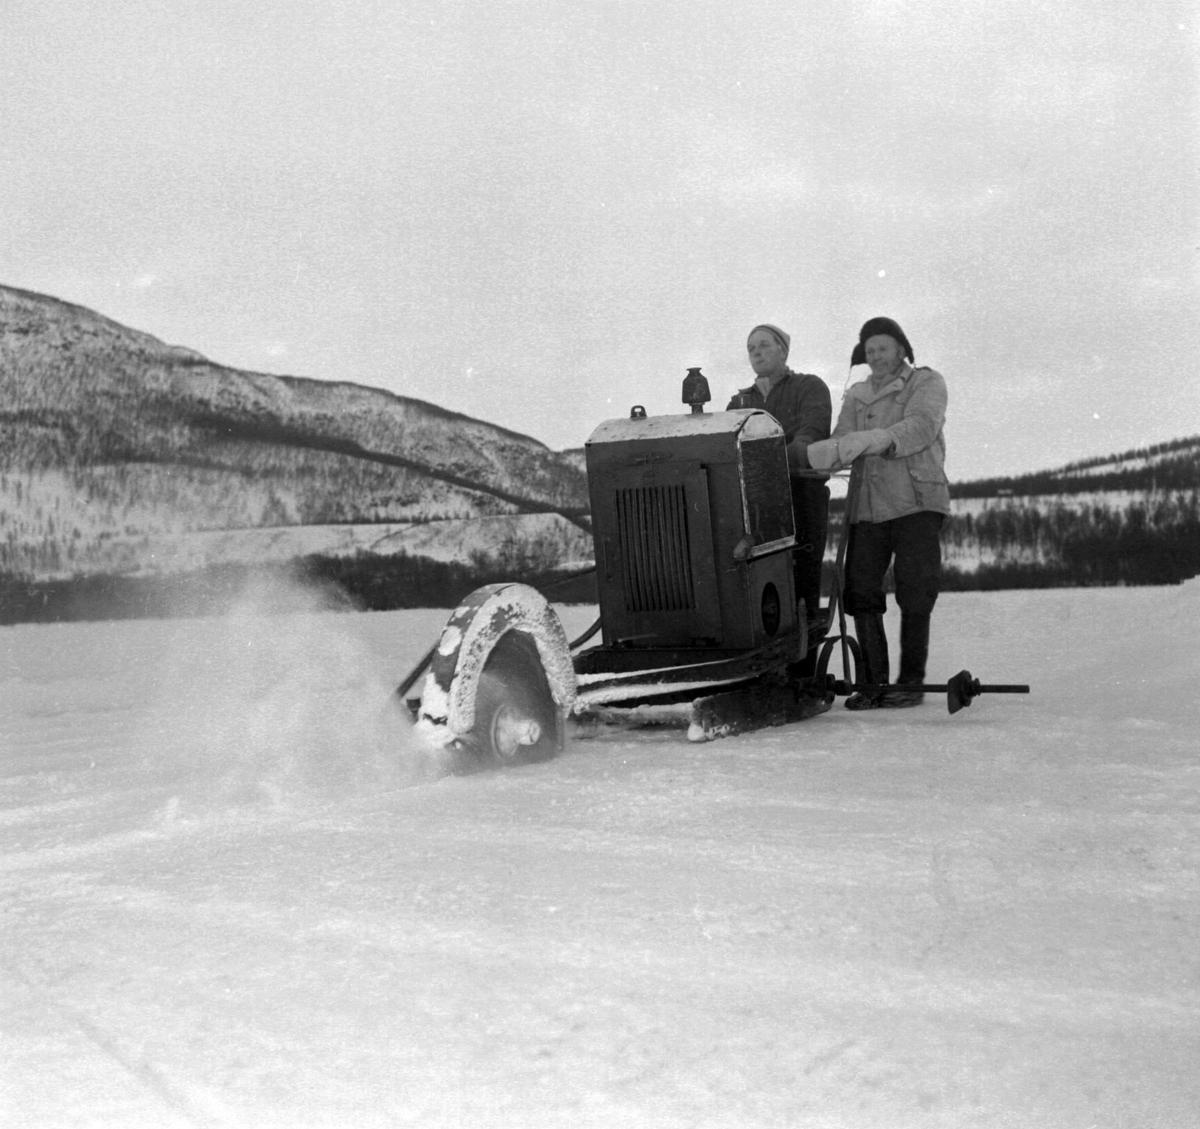 Isskjæring på Møkkelandsvannet, 1960. Isen sages med maskin.